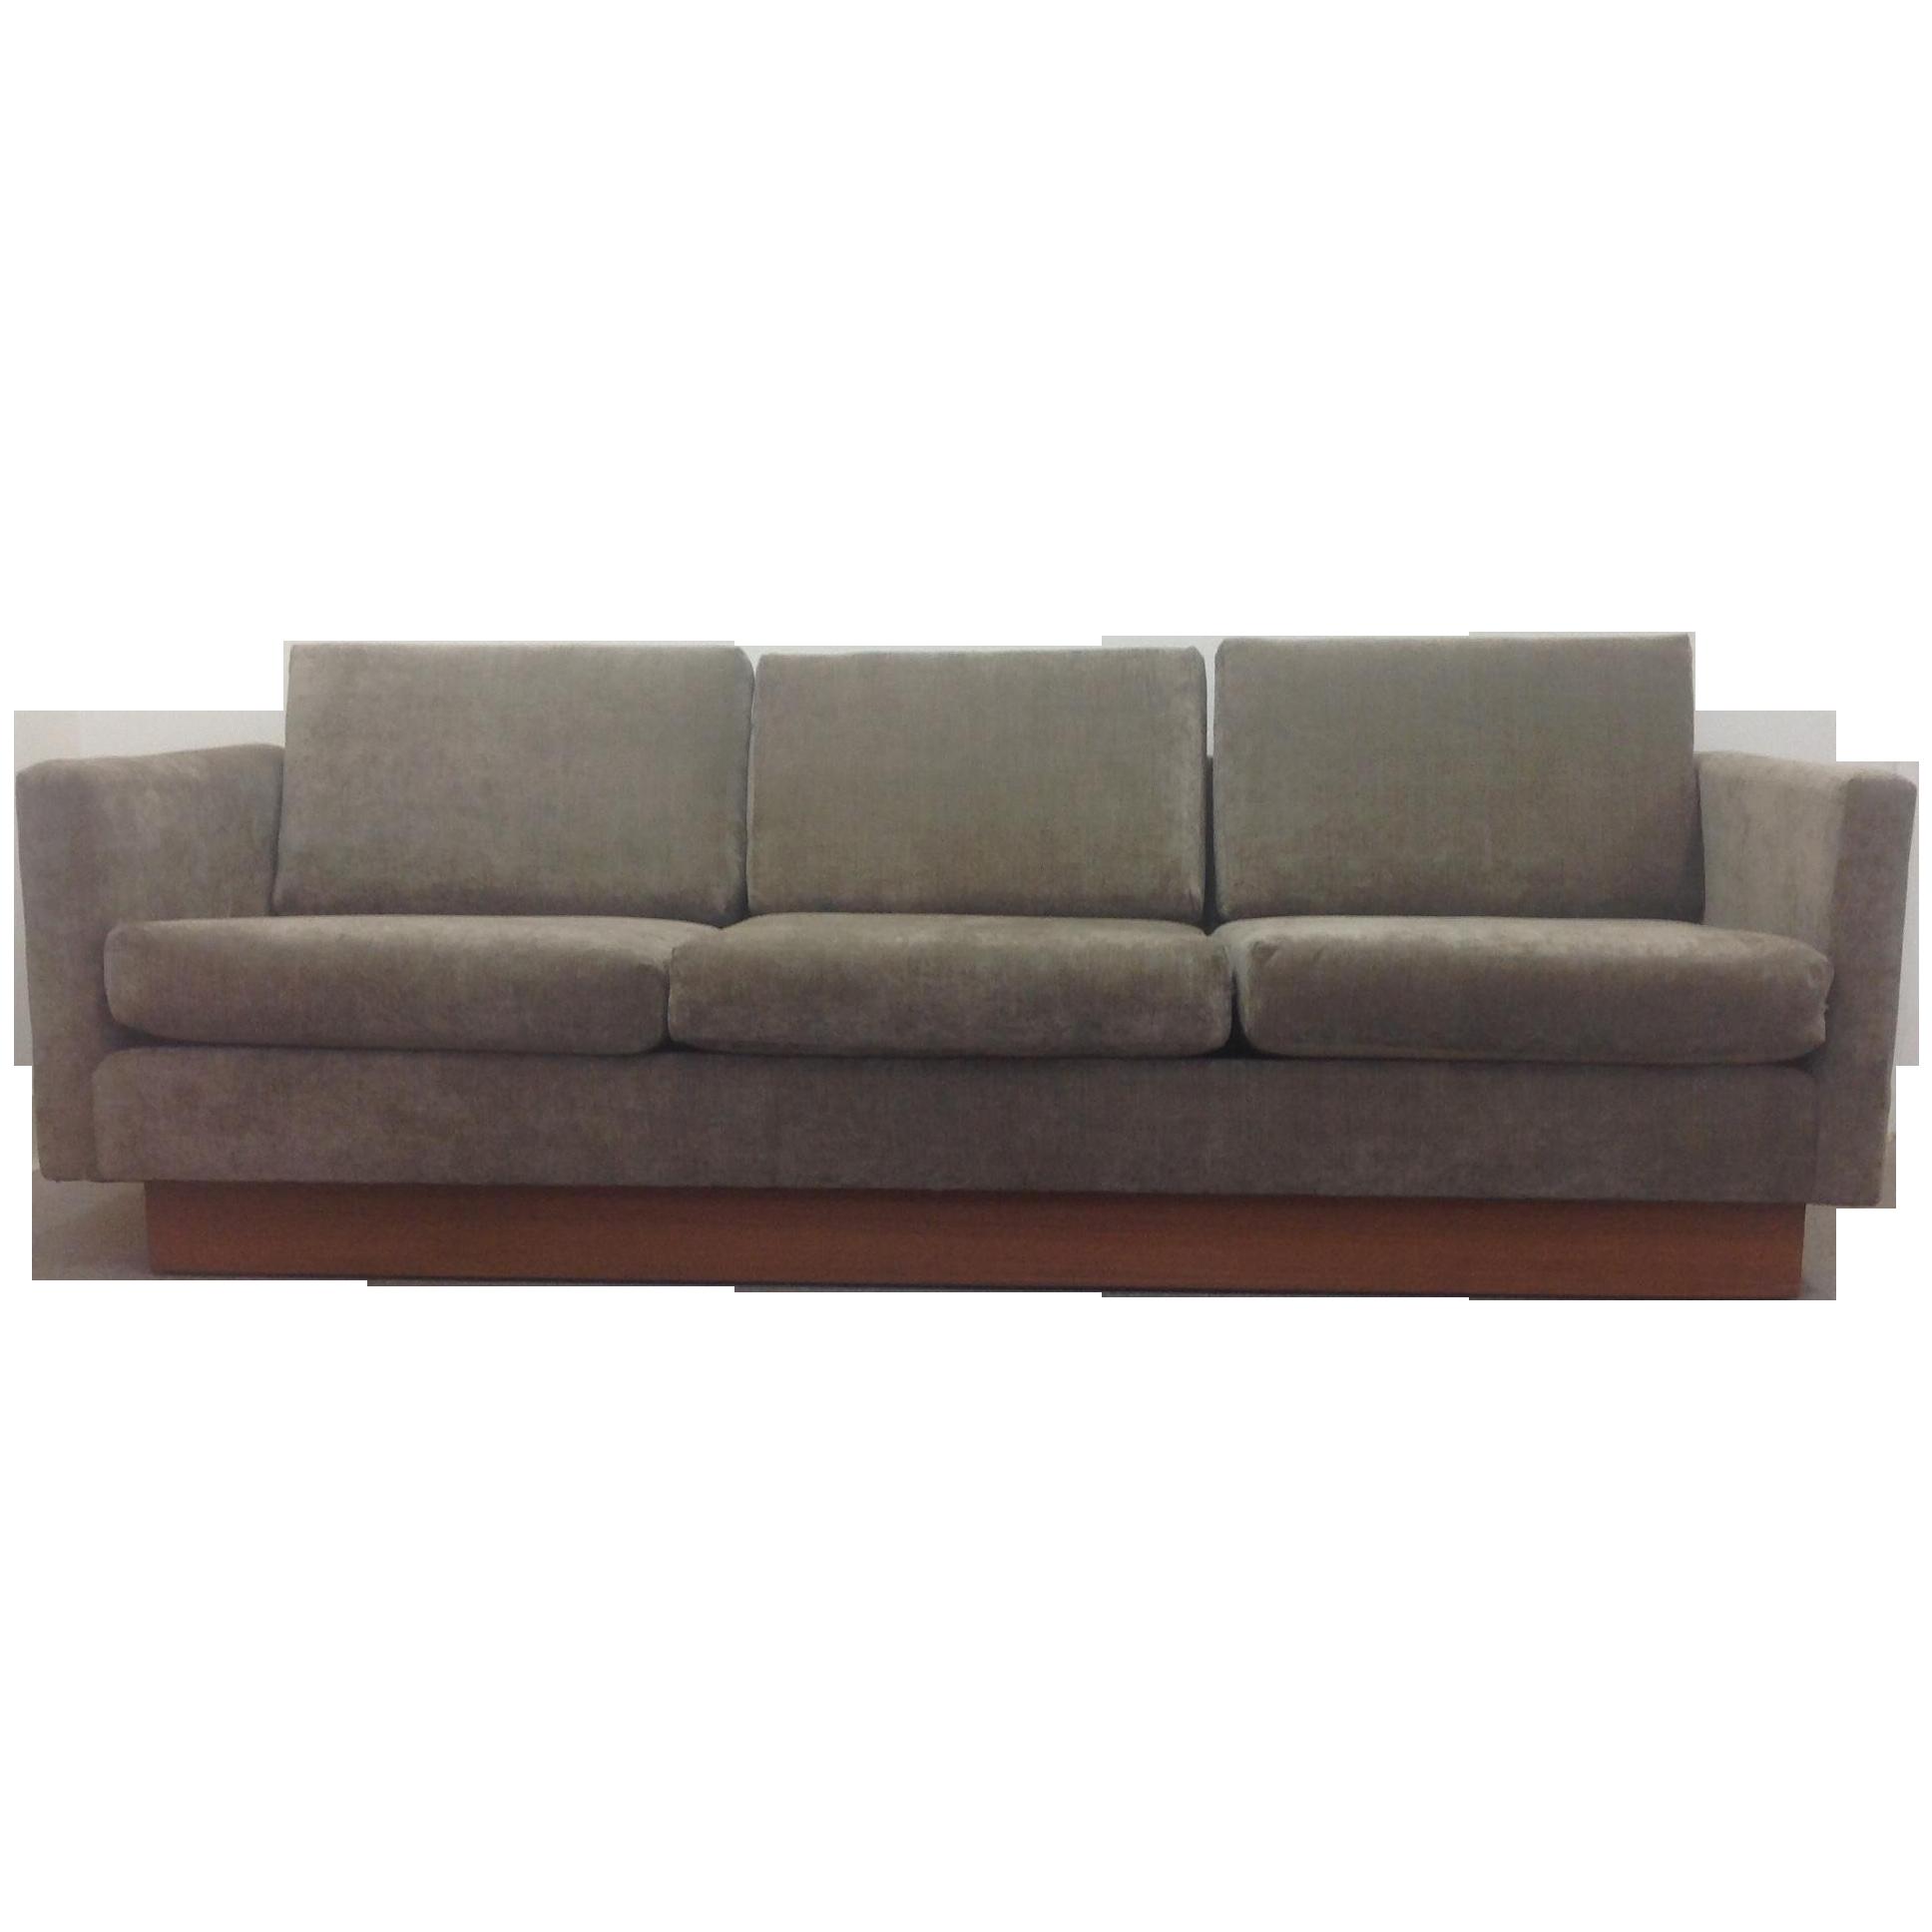 Mid Century Modern Grey Velvet Sofa Chairish : 9d0fbf01 38ce 4733 a5c0 7ef41b94caed from www.chairish.com size 1936 x 1936 png 828kB